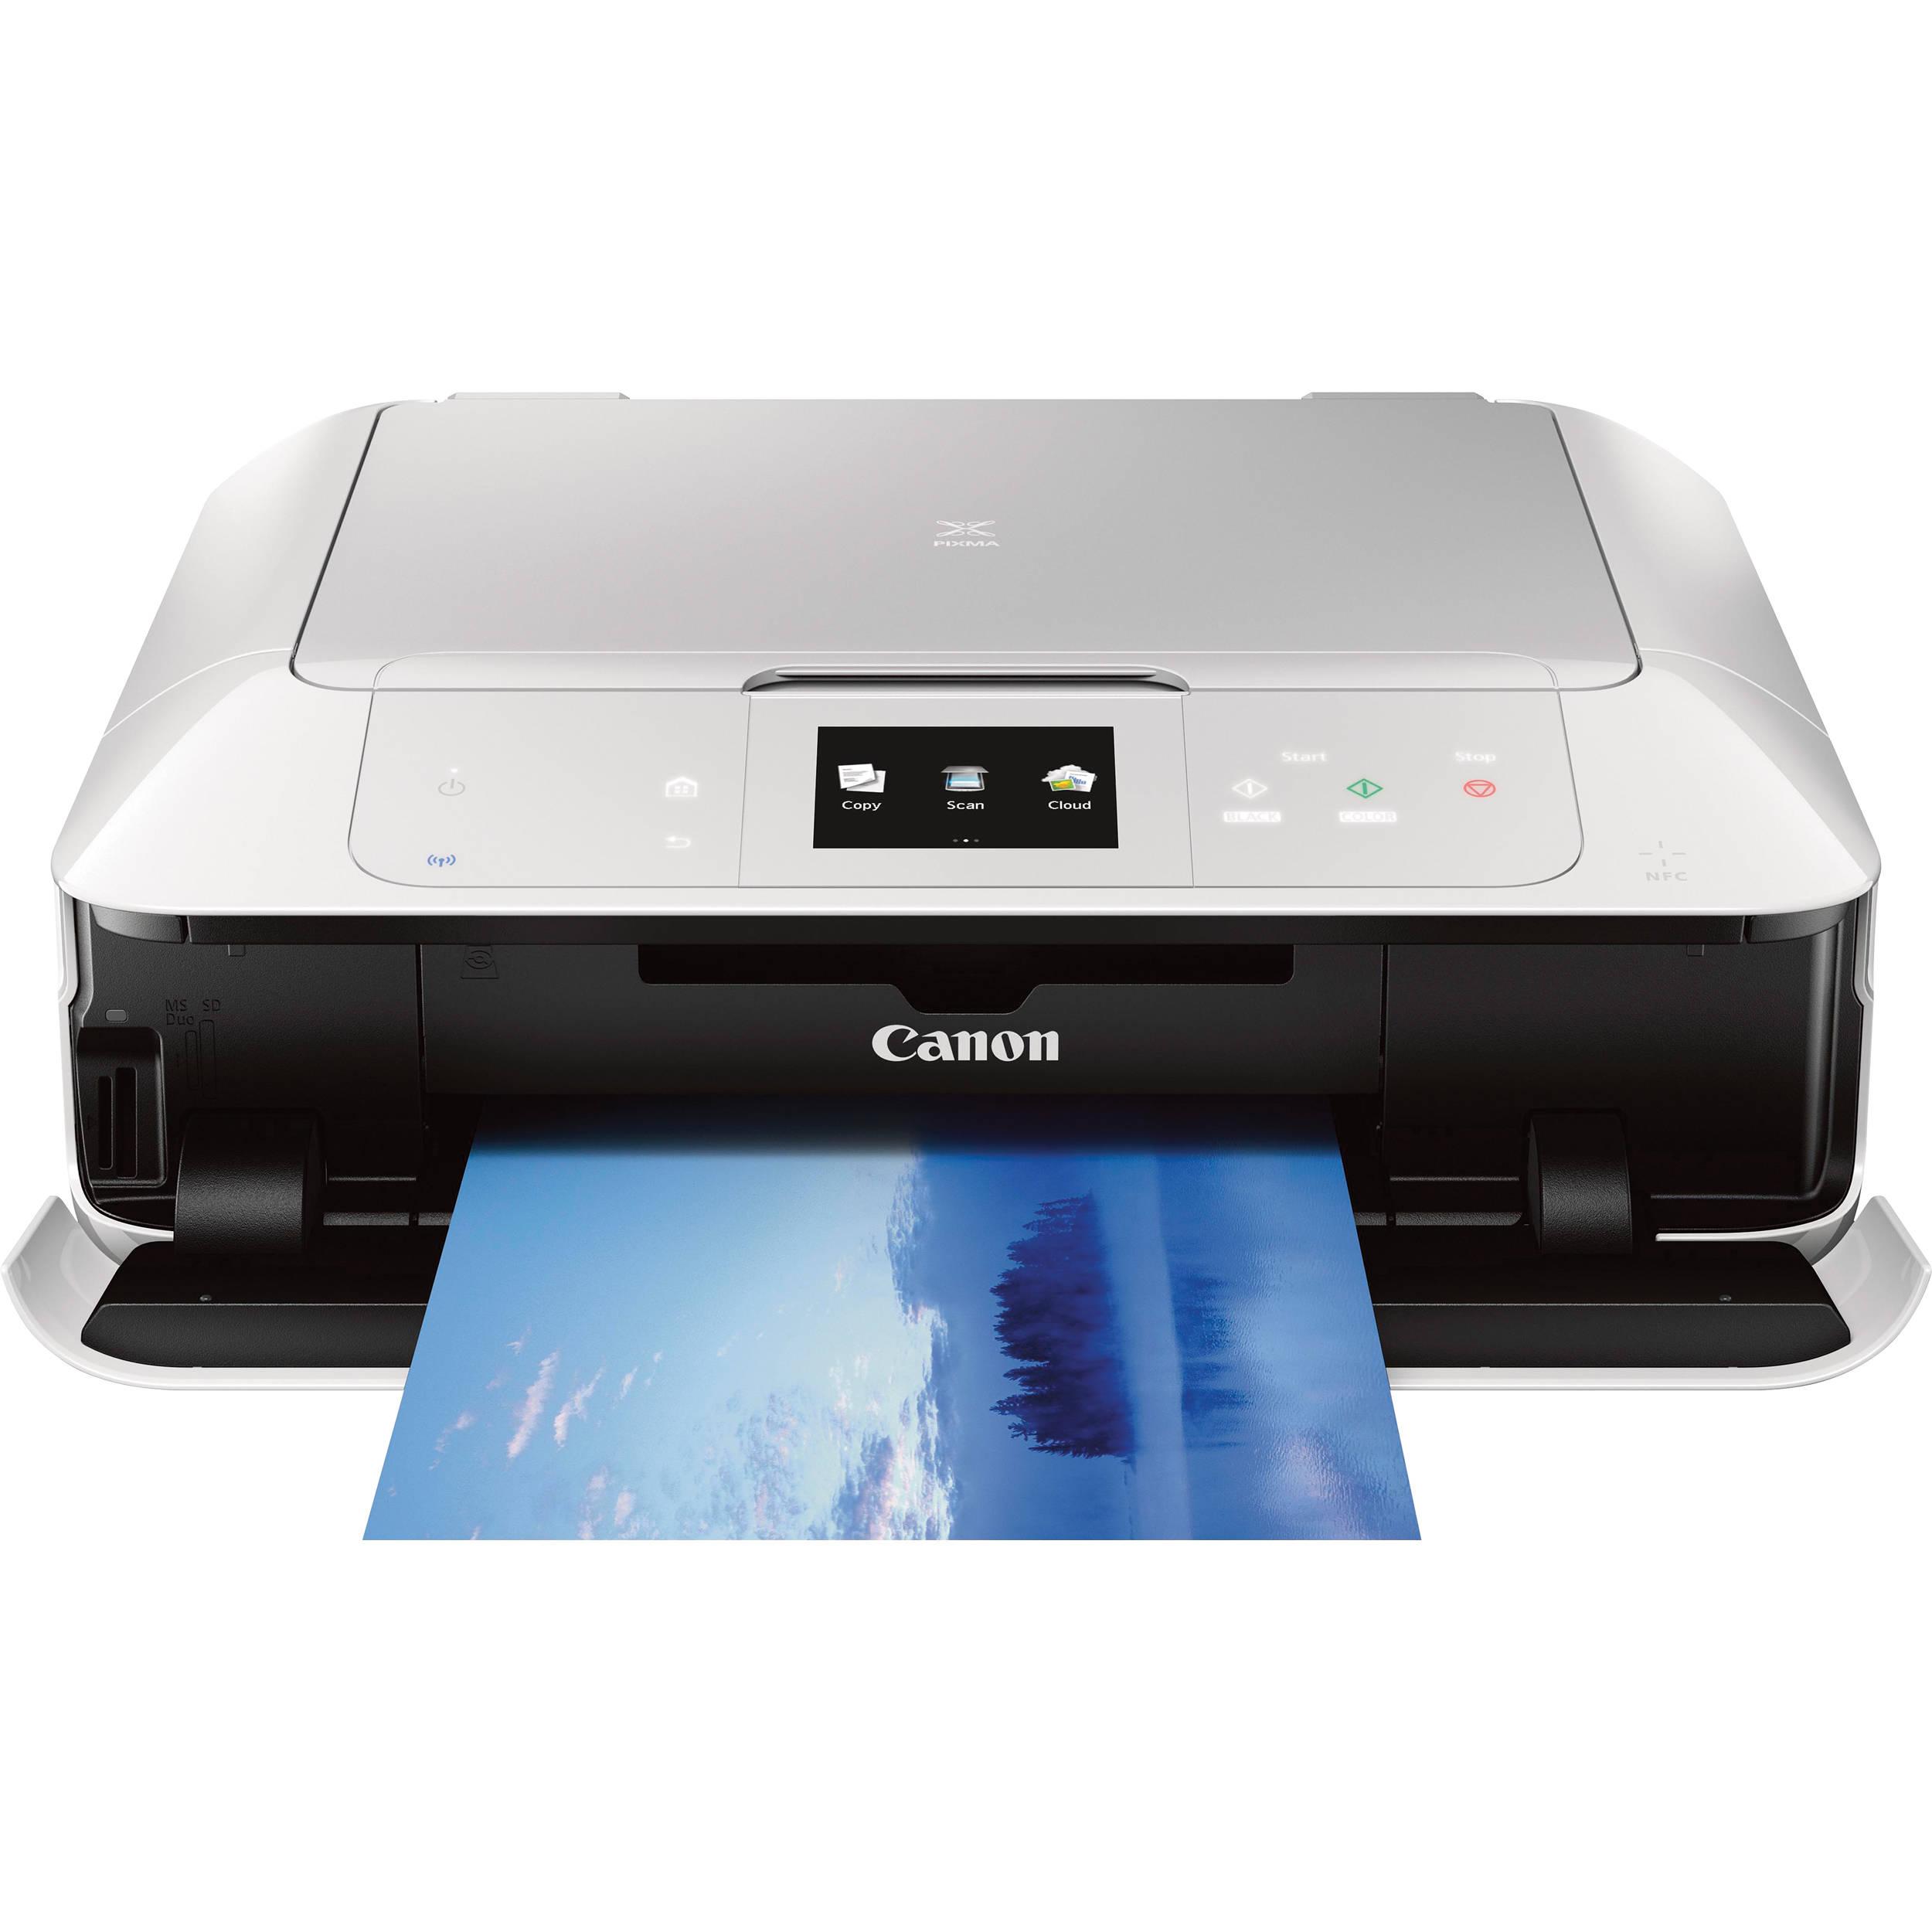 canon pixma mg7520 wireless all in one inkjet printer 9489b022. Black Bedroom Furniture Sets. Home Design Ideas